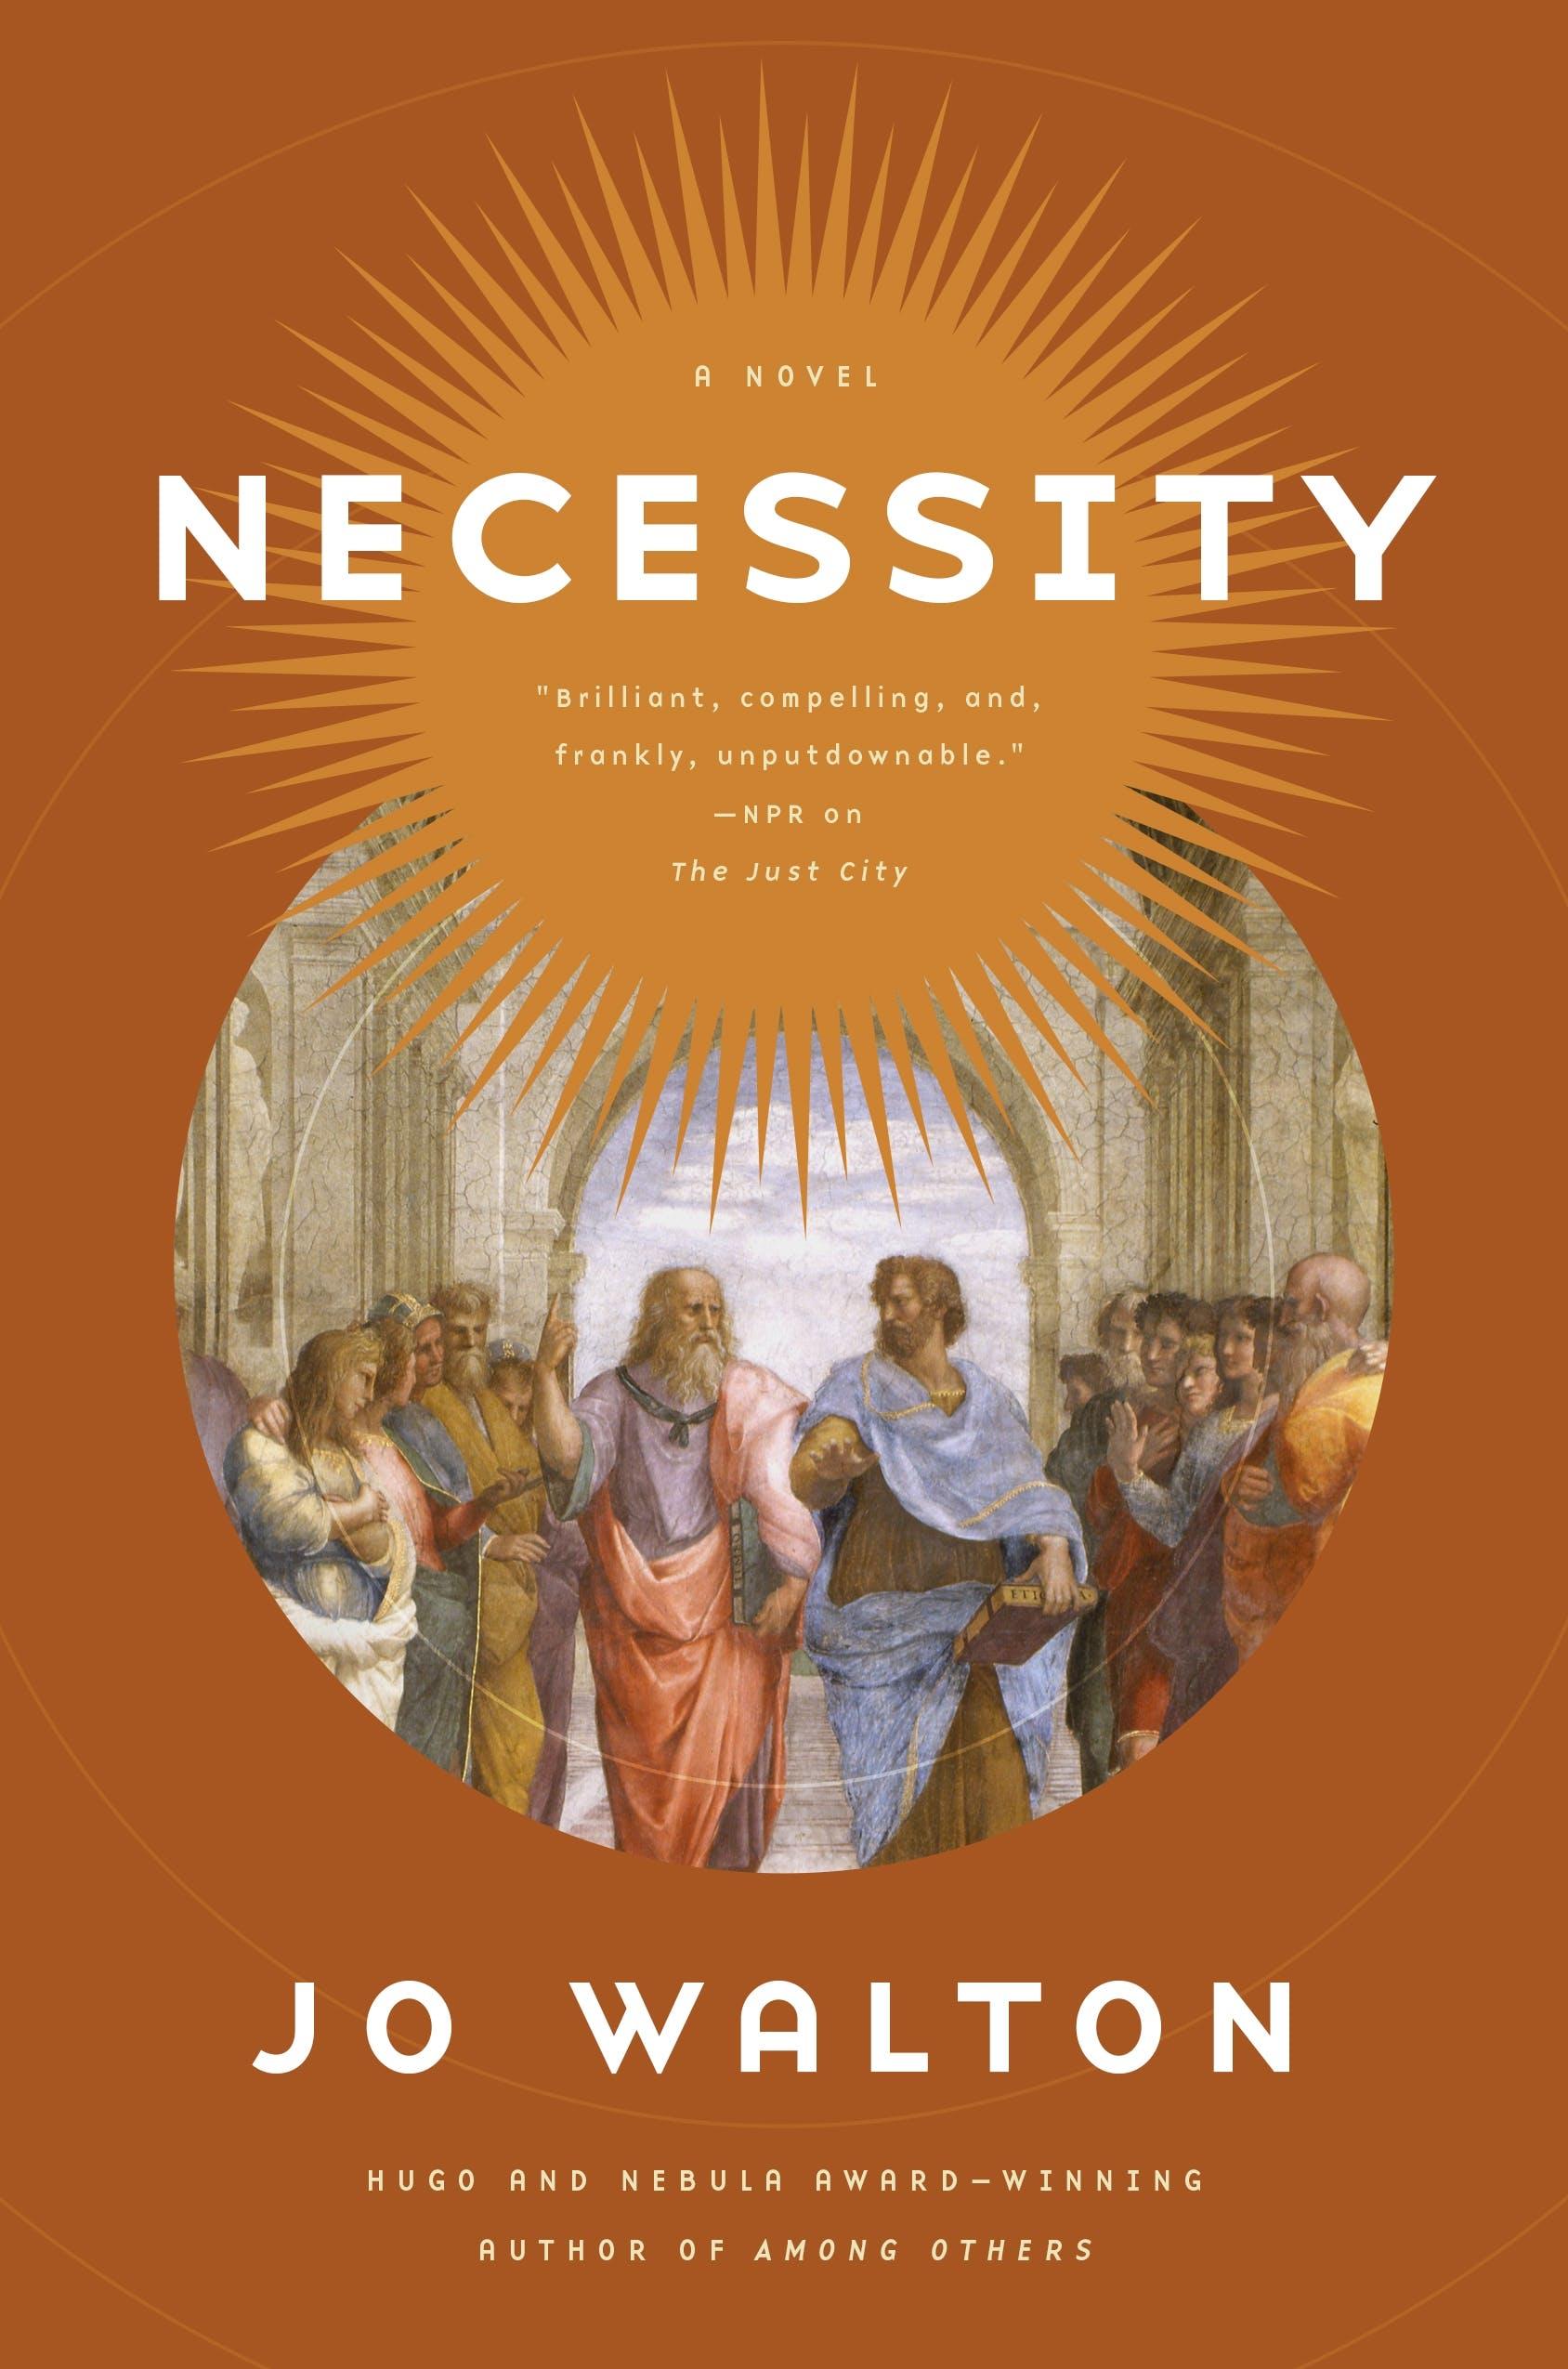 Image of Necessity